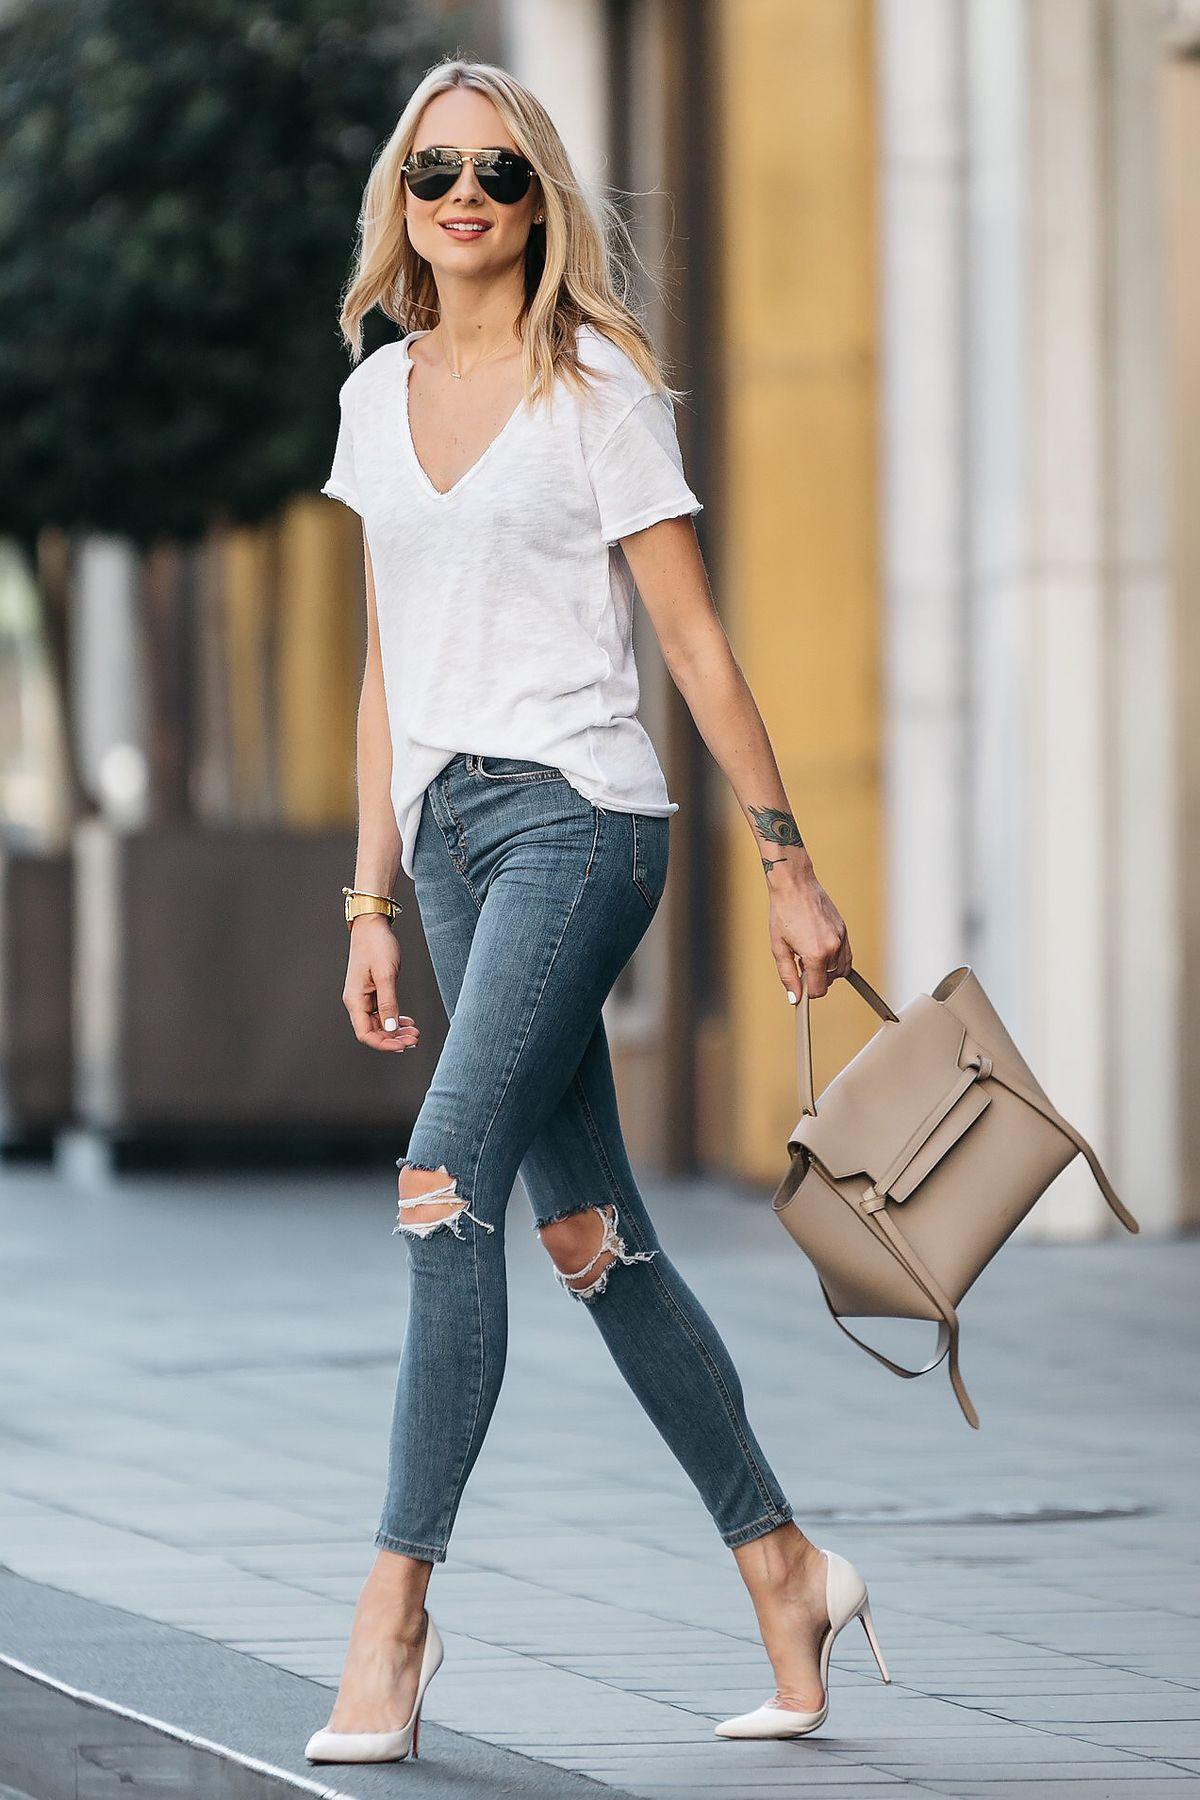 Fashion Jackson, Dallas Blogger, Fashion Blogger, Street Style, White Tshirt, Topshop Denim Ripped Skinny Jeans, Christian Louboutin White Pumps, Celine Belt Handbag, Celine Aviator Sunglasses